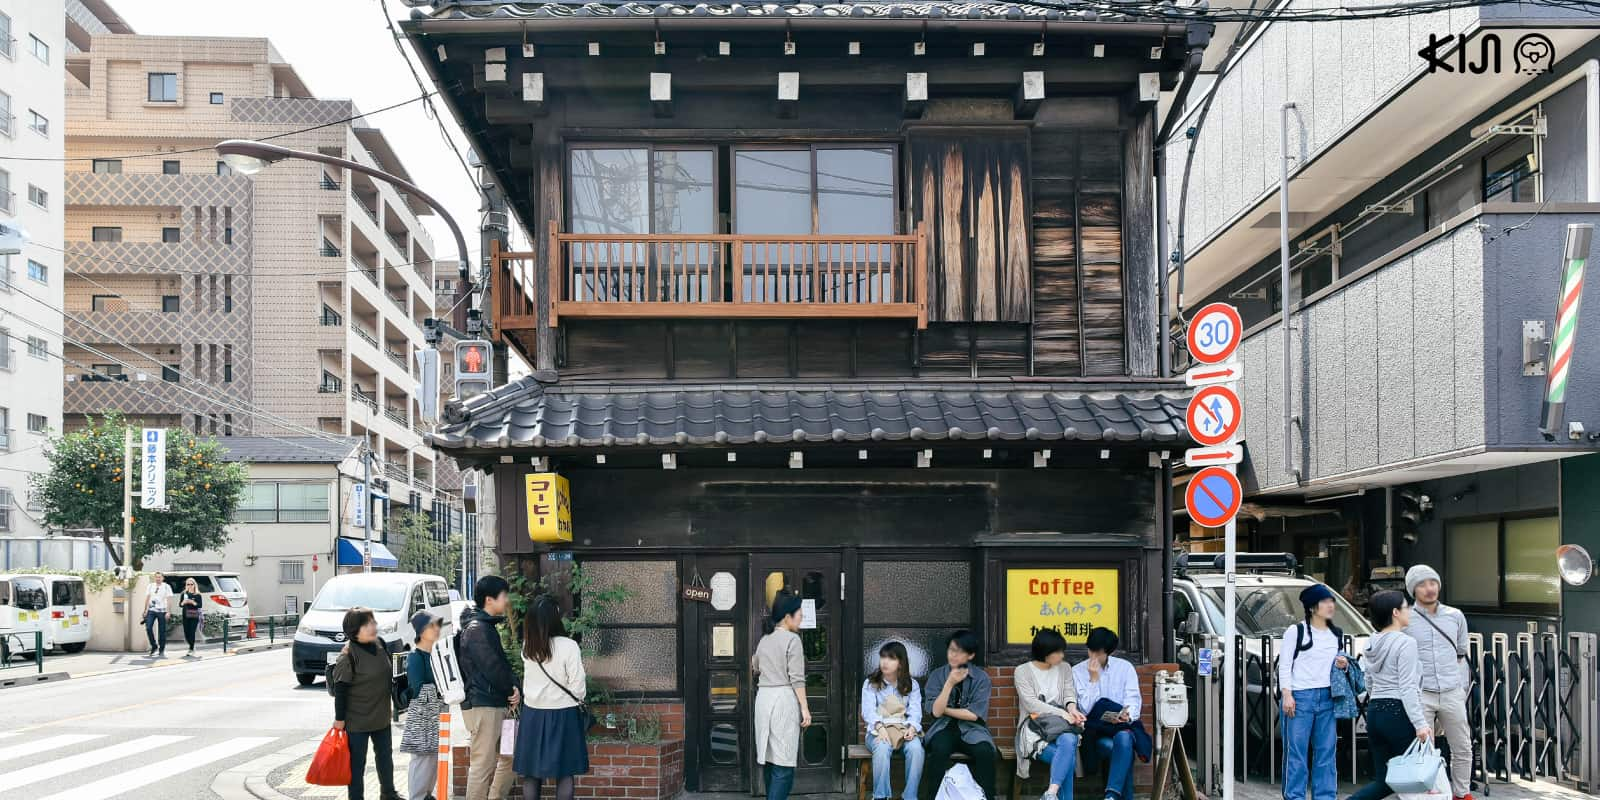 Kayaba Coffee ร้านกาแฟ เก่าแก่ใน โตเกียว